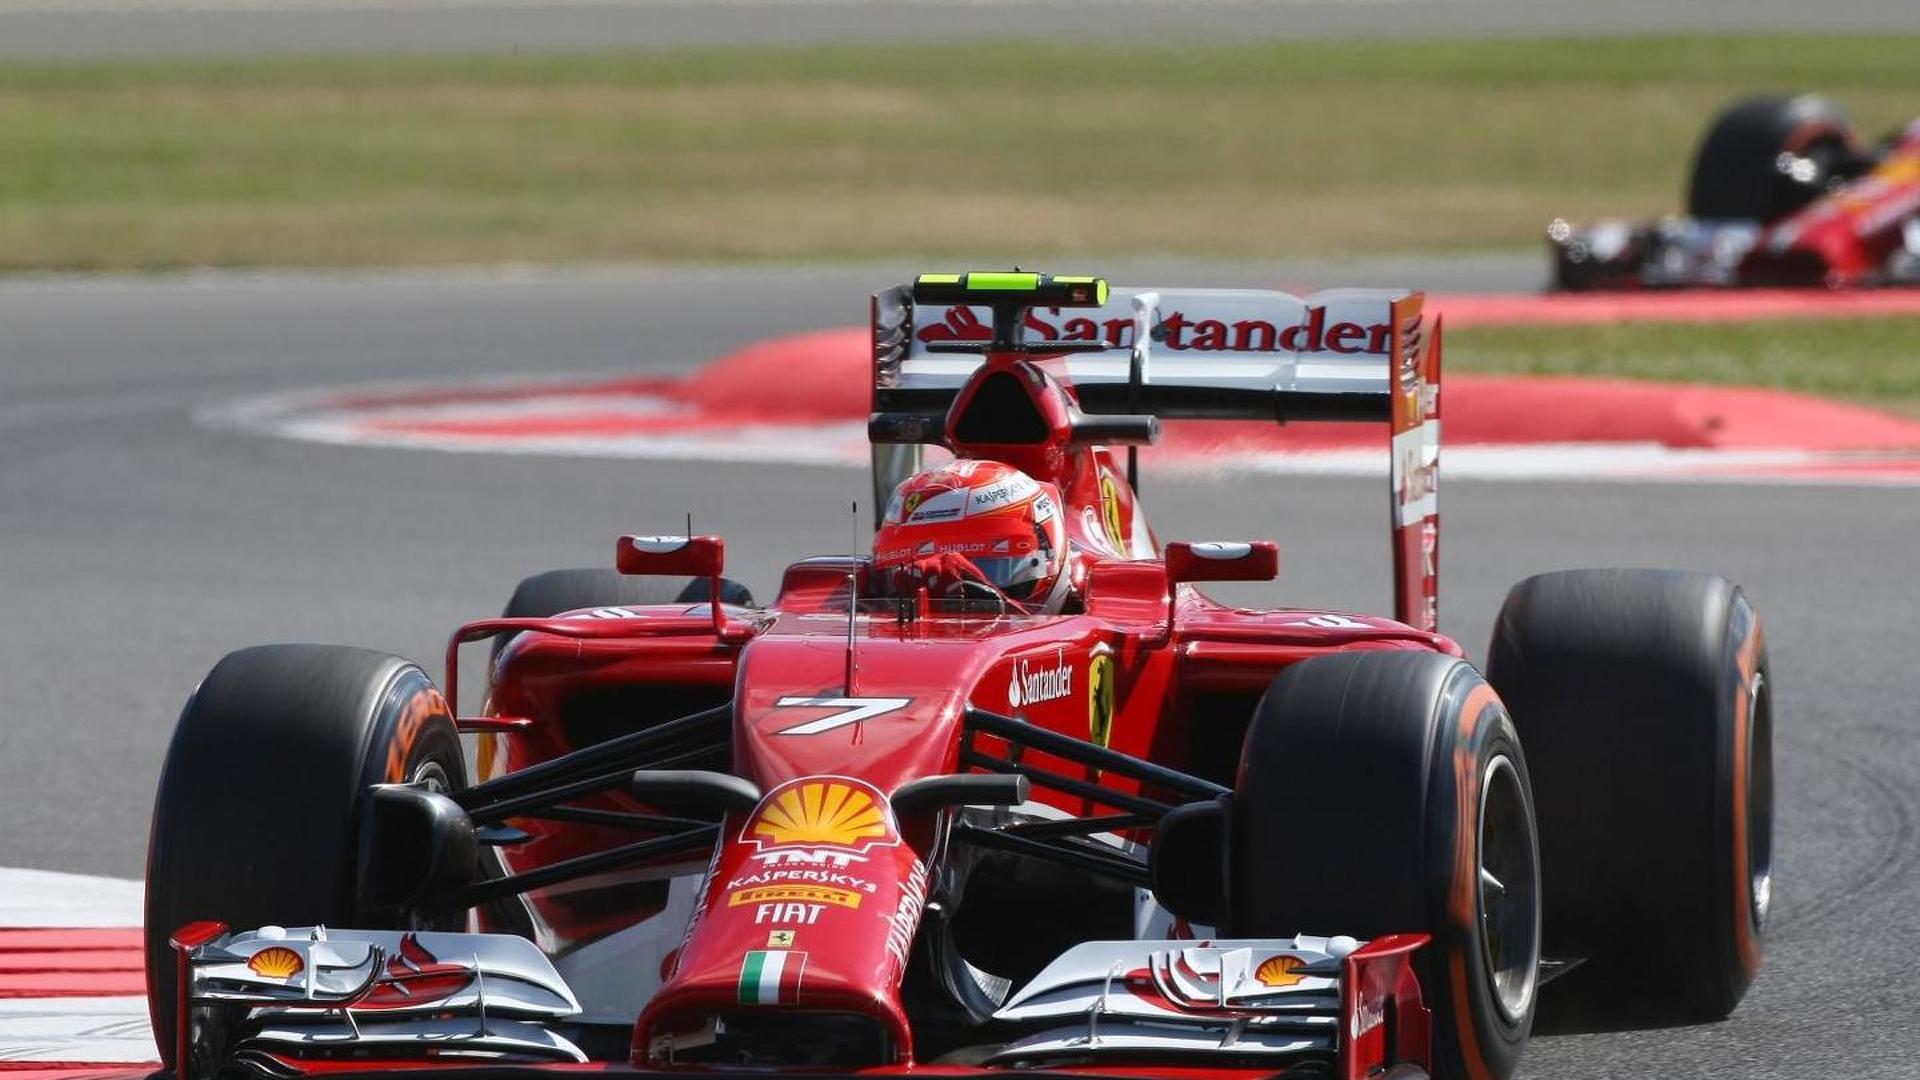 Raikkonen will be 'great' again - Mattiacci